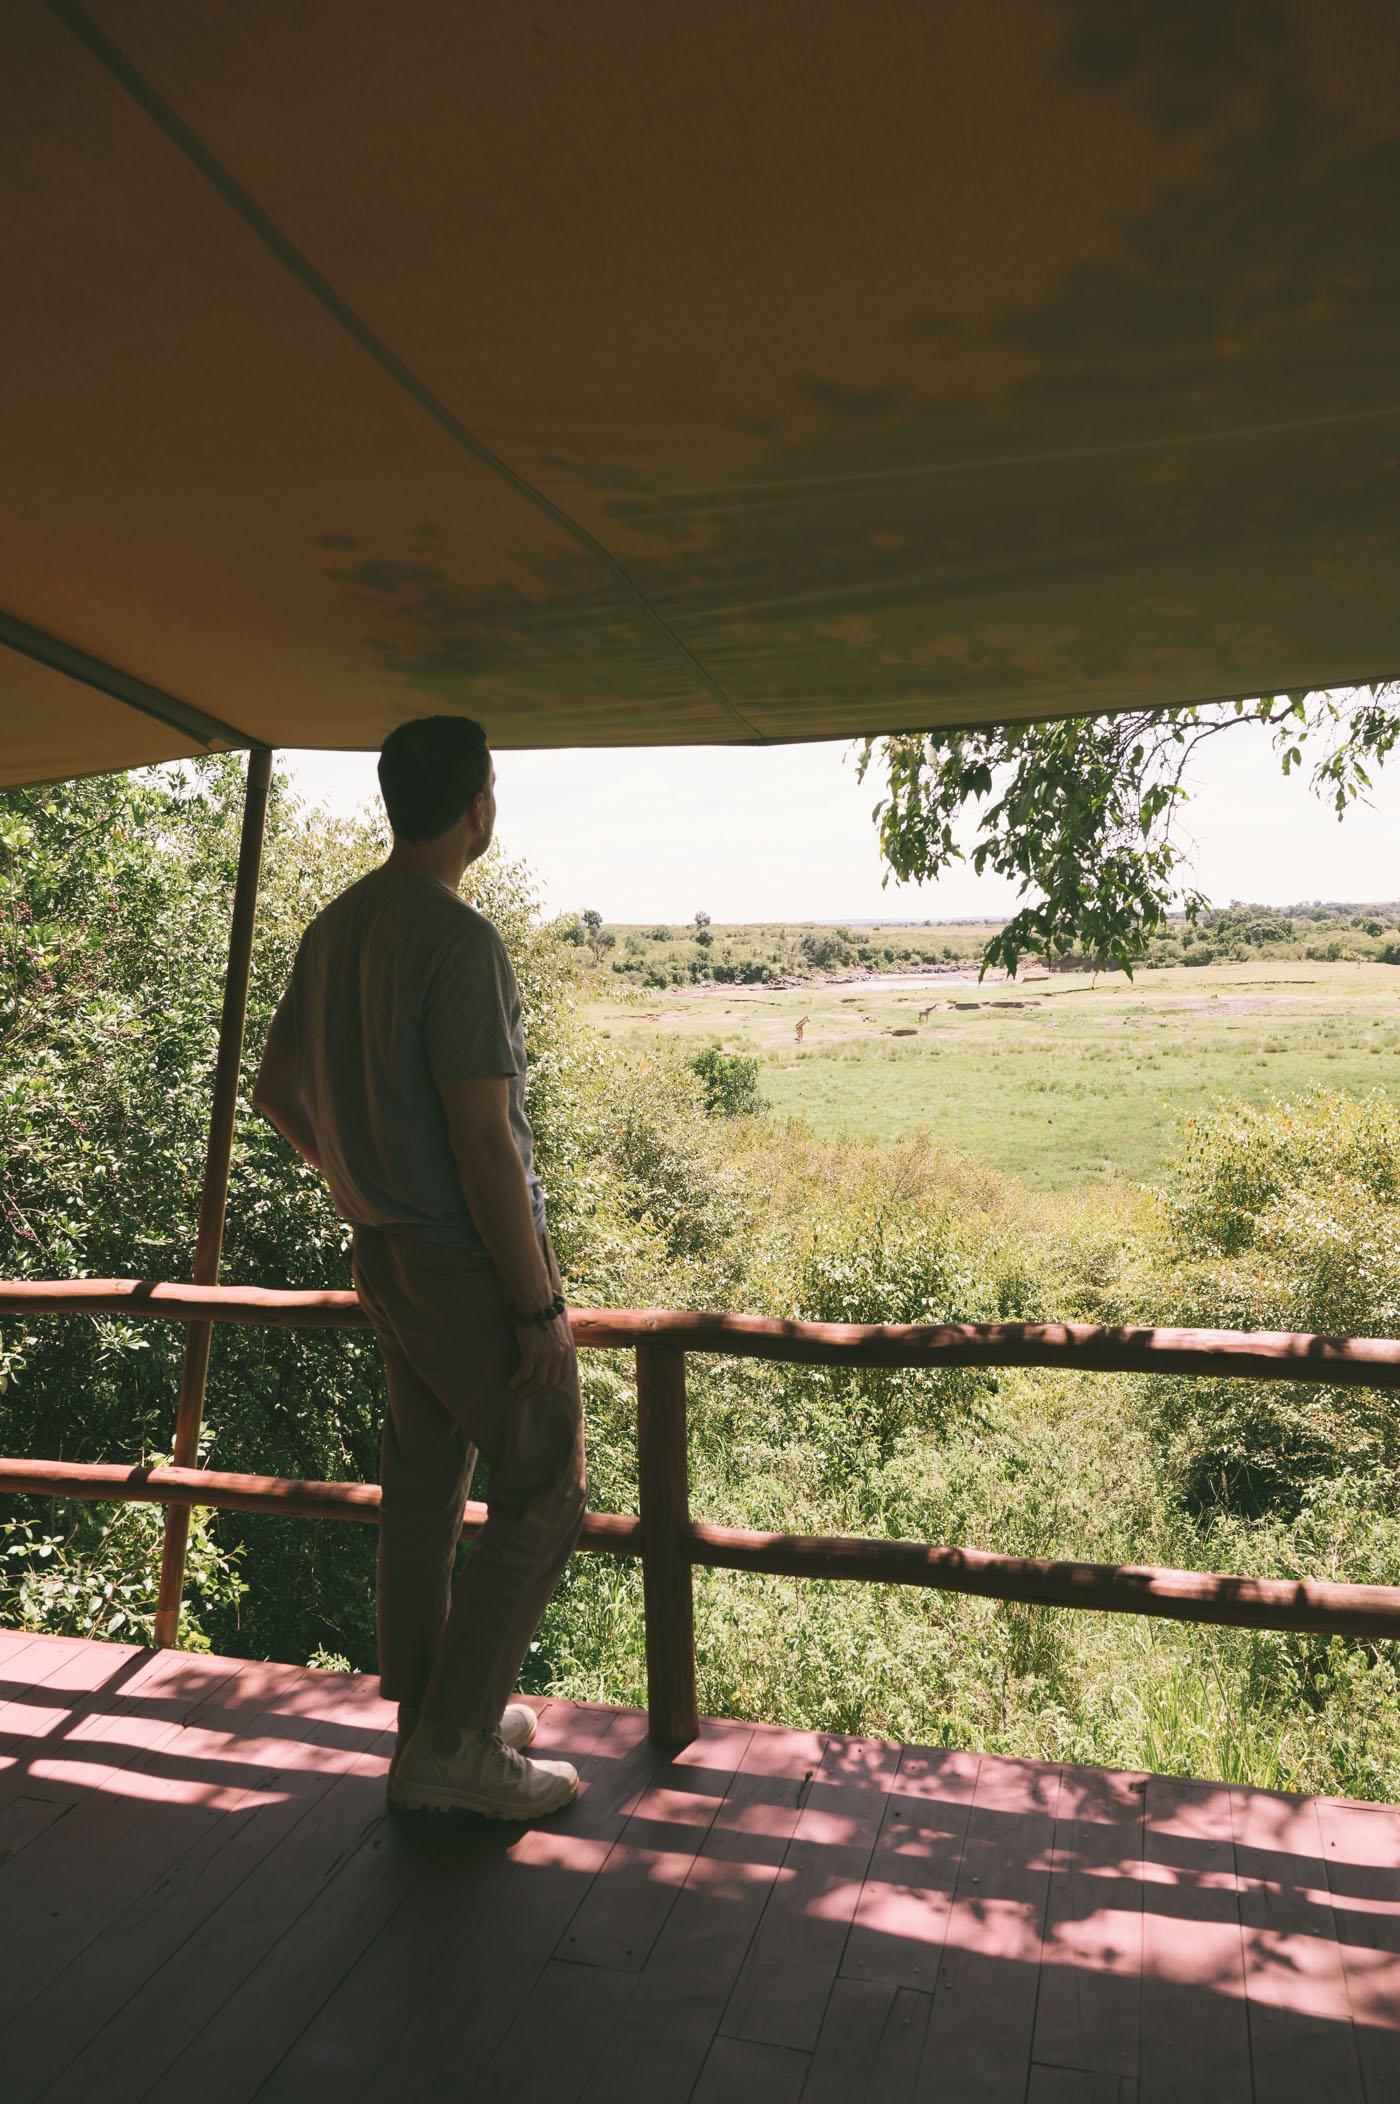 Tangulia Mara Camp in the Maasai Mara in Kenya